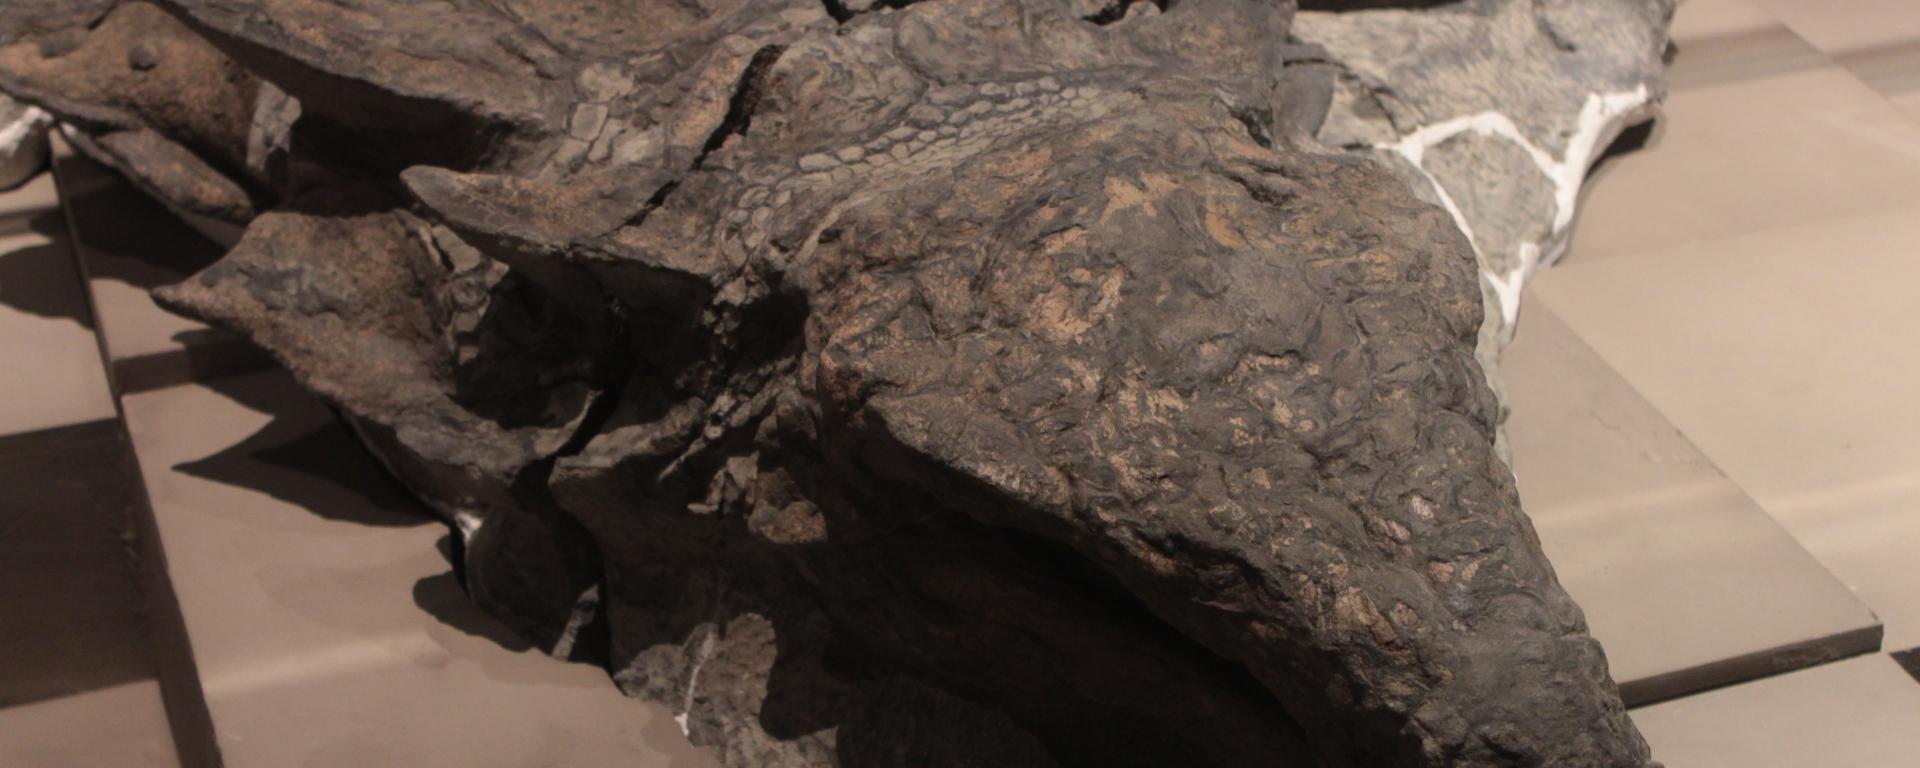 Nodosaur, Alberta, fossil, Royal Tyrrell Museum, Alberta, Drumheller, Canada